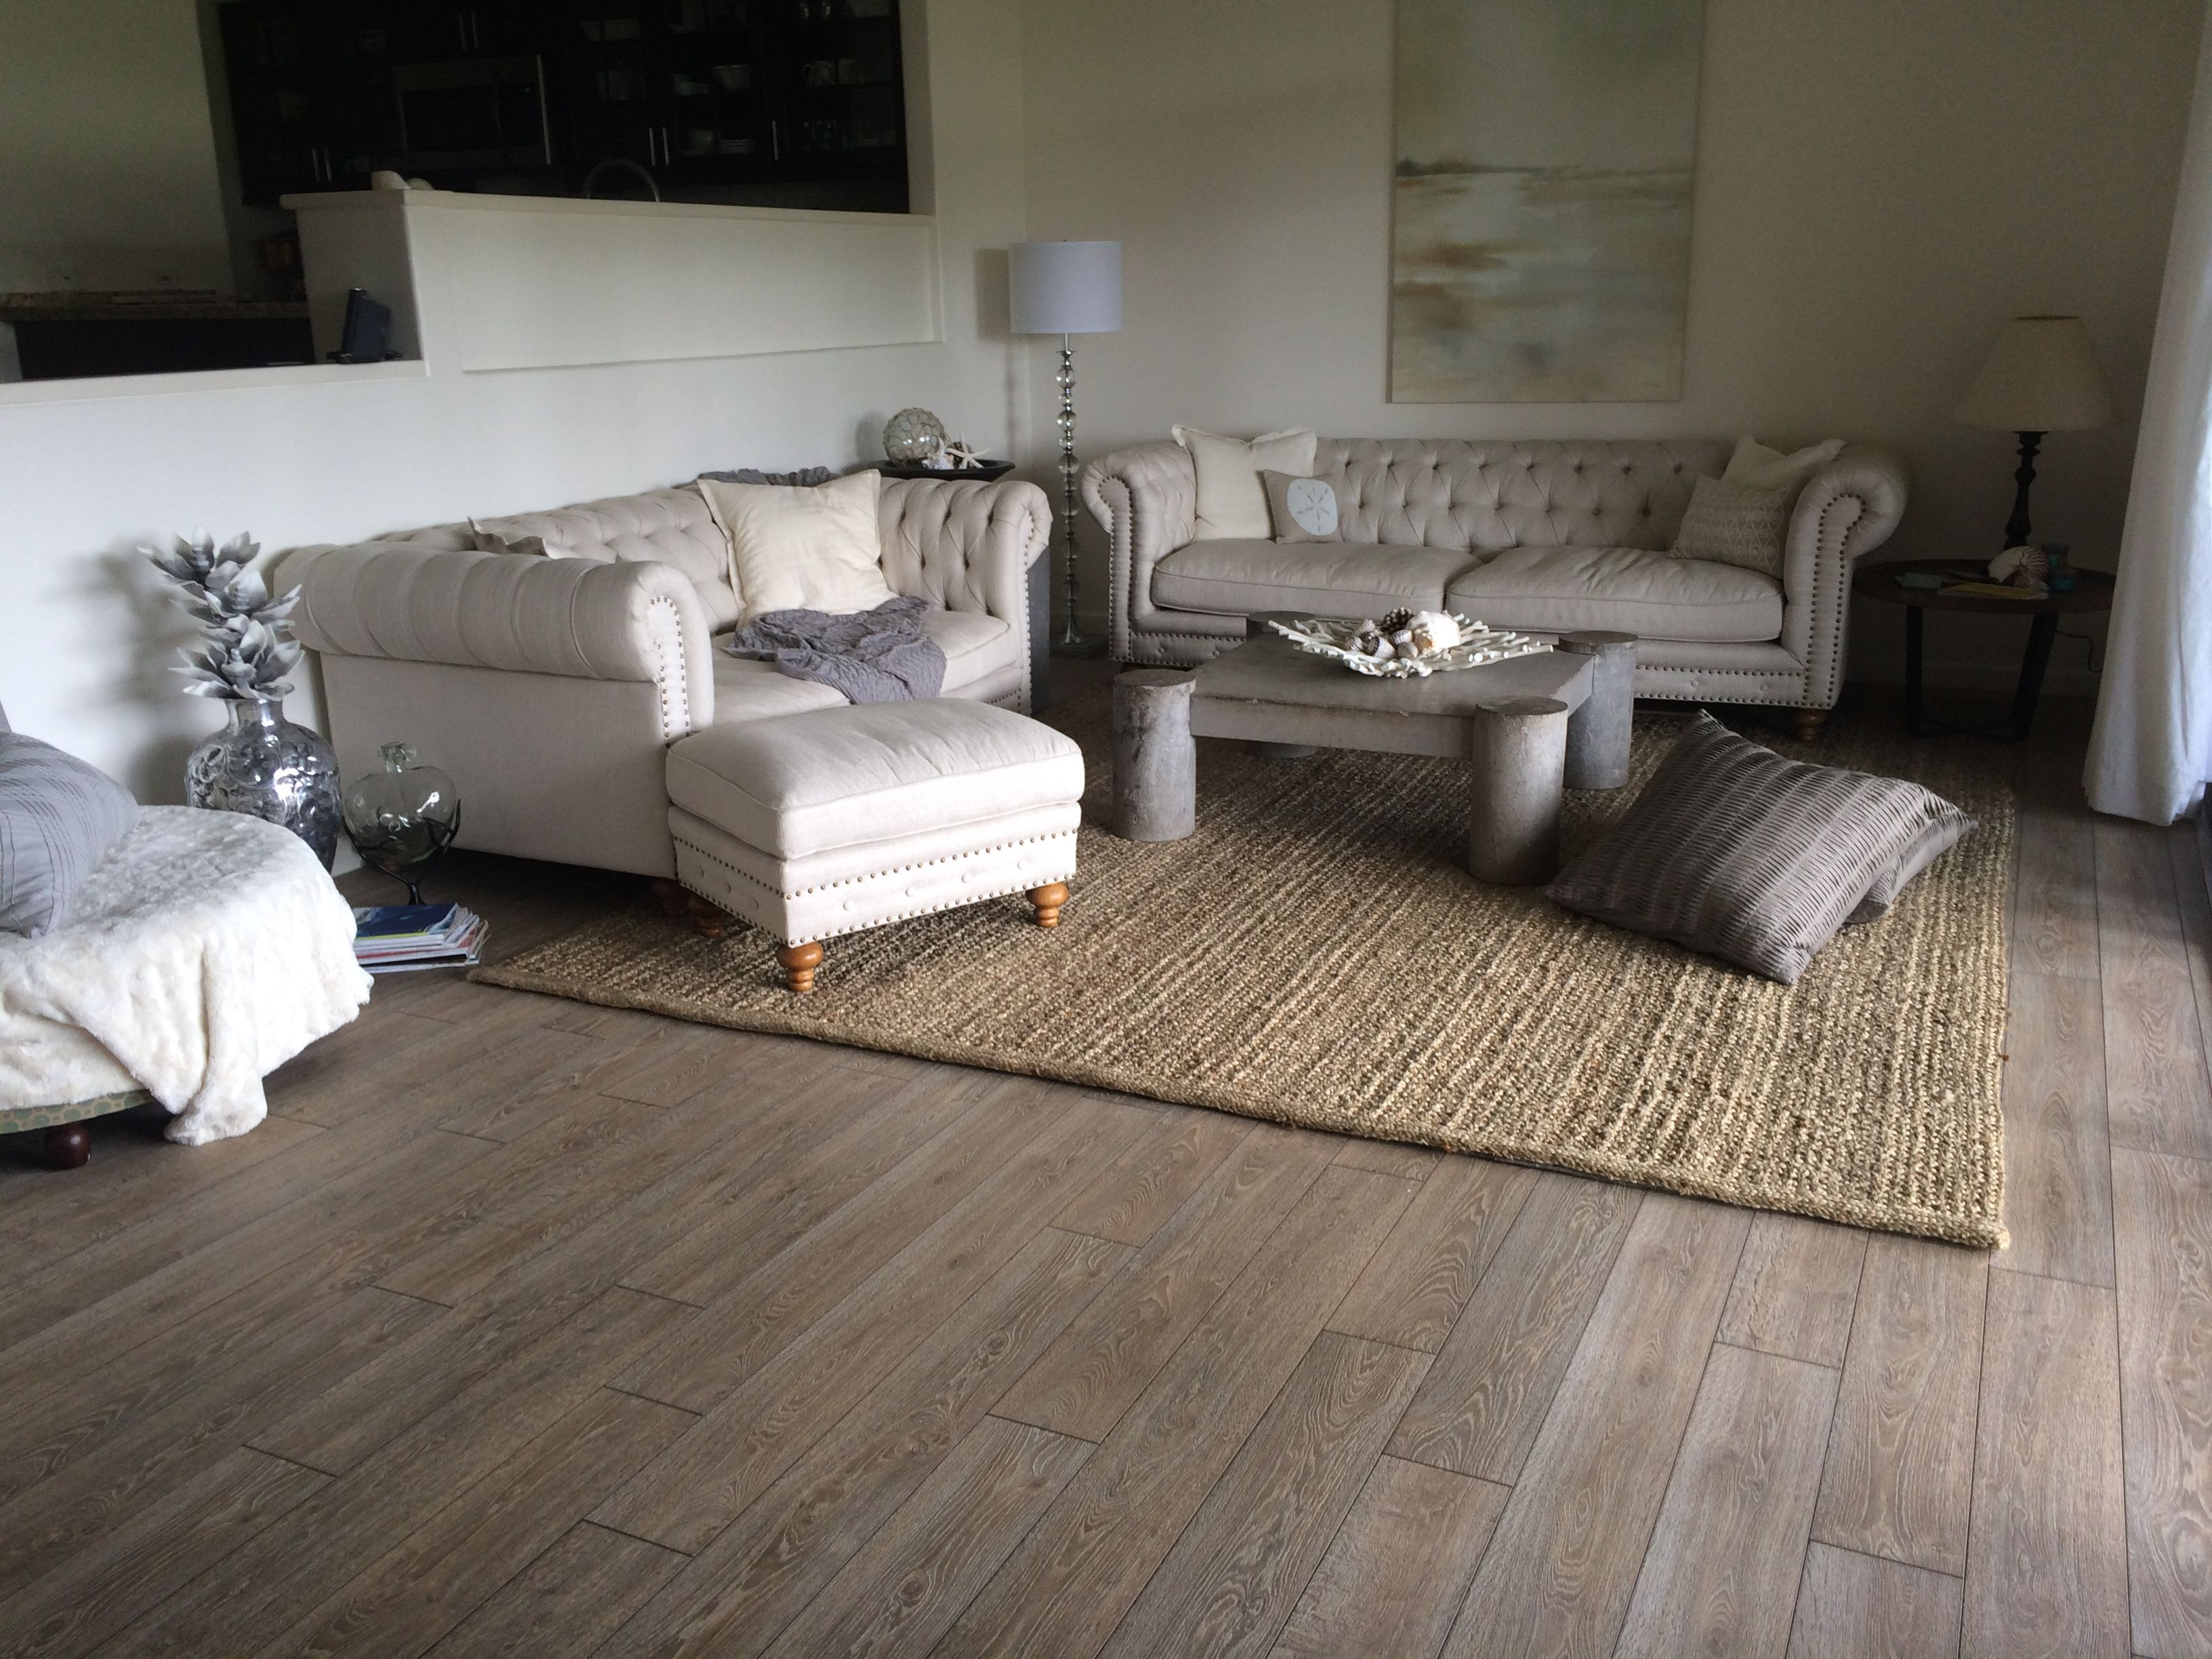 Michelle Mcgrath Lewis Laminate Restorations Collection Black Forest Oak Color Weathered Lei Flooring Lamina Flooring Flooring Inspiration Flooring Store